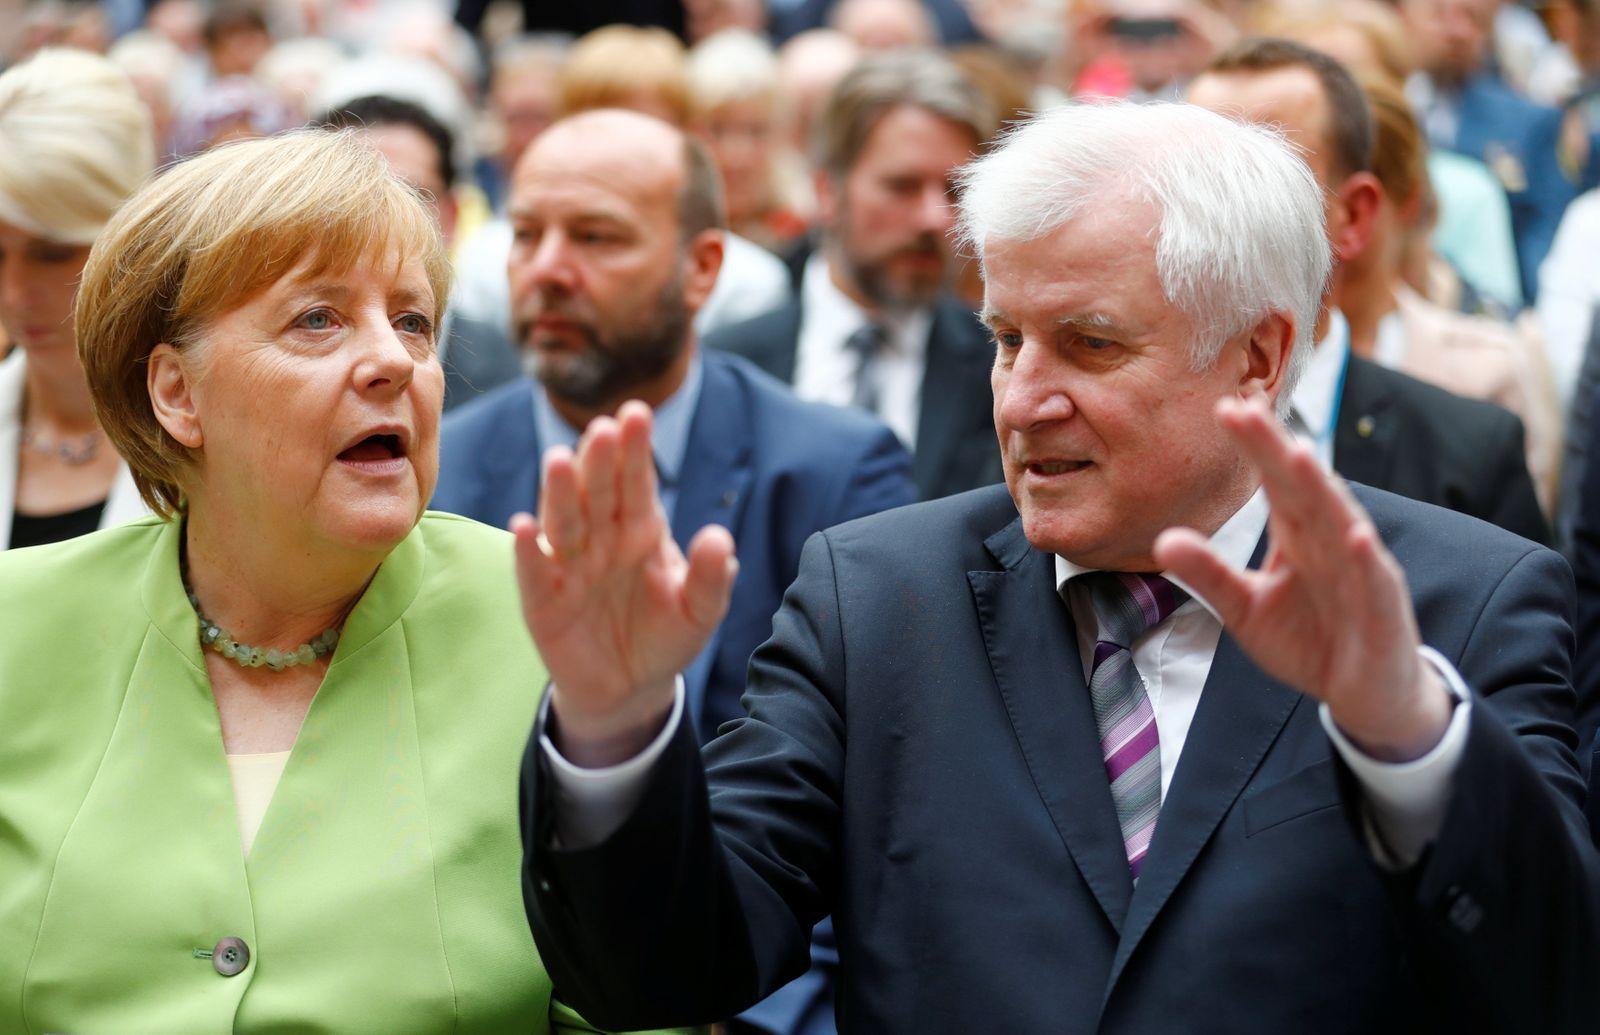 GERMANY-POLITICS/